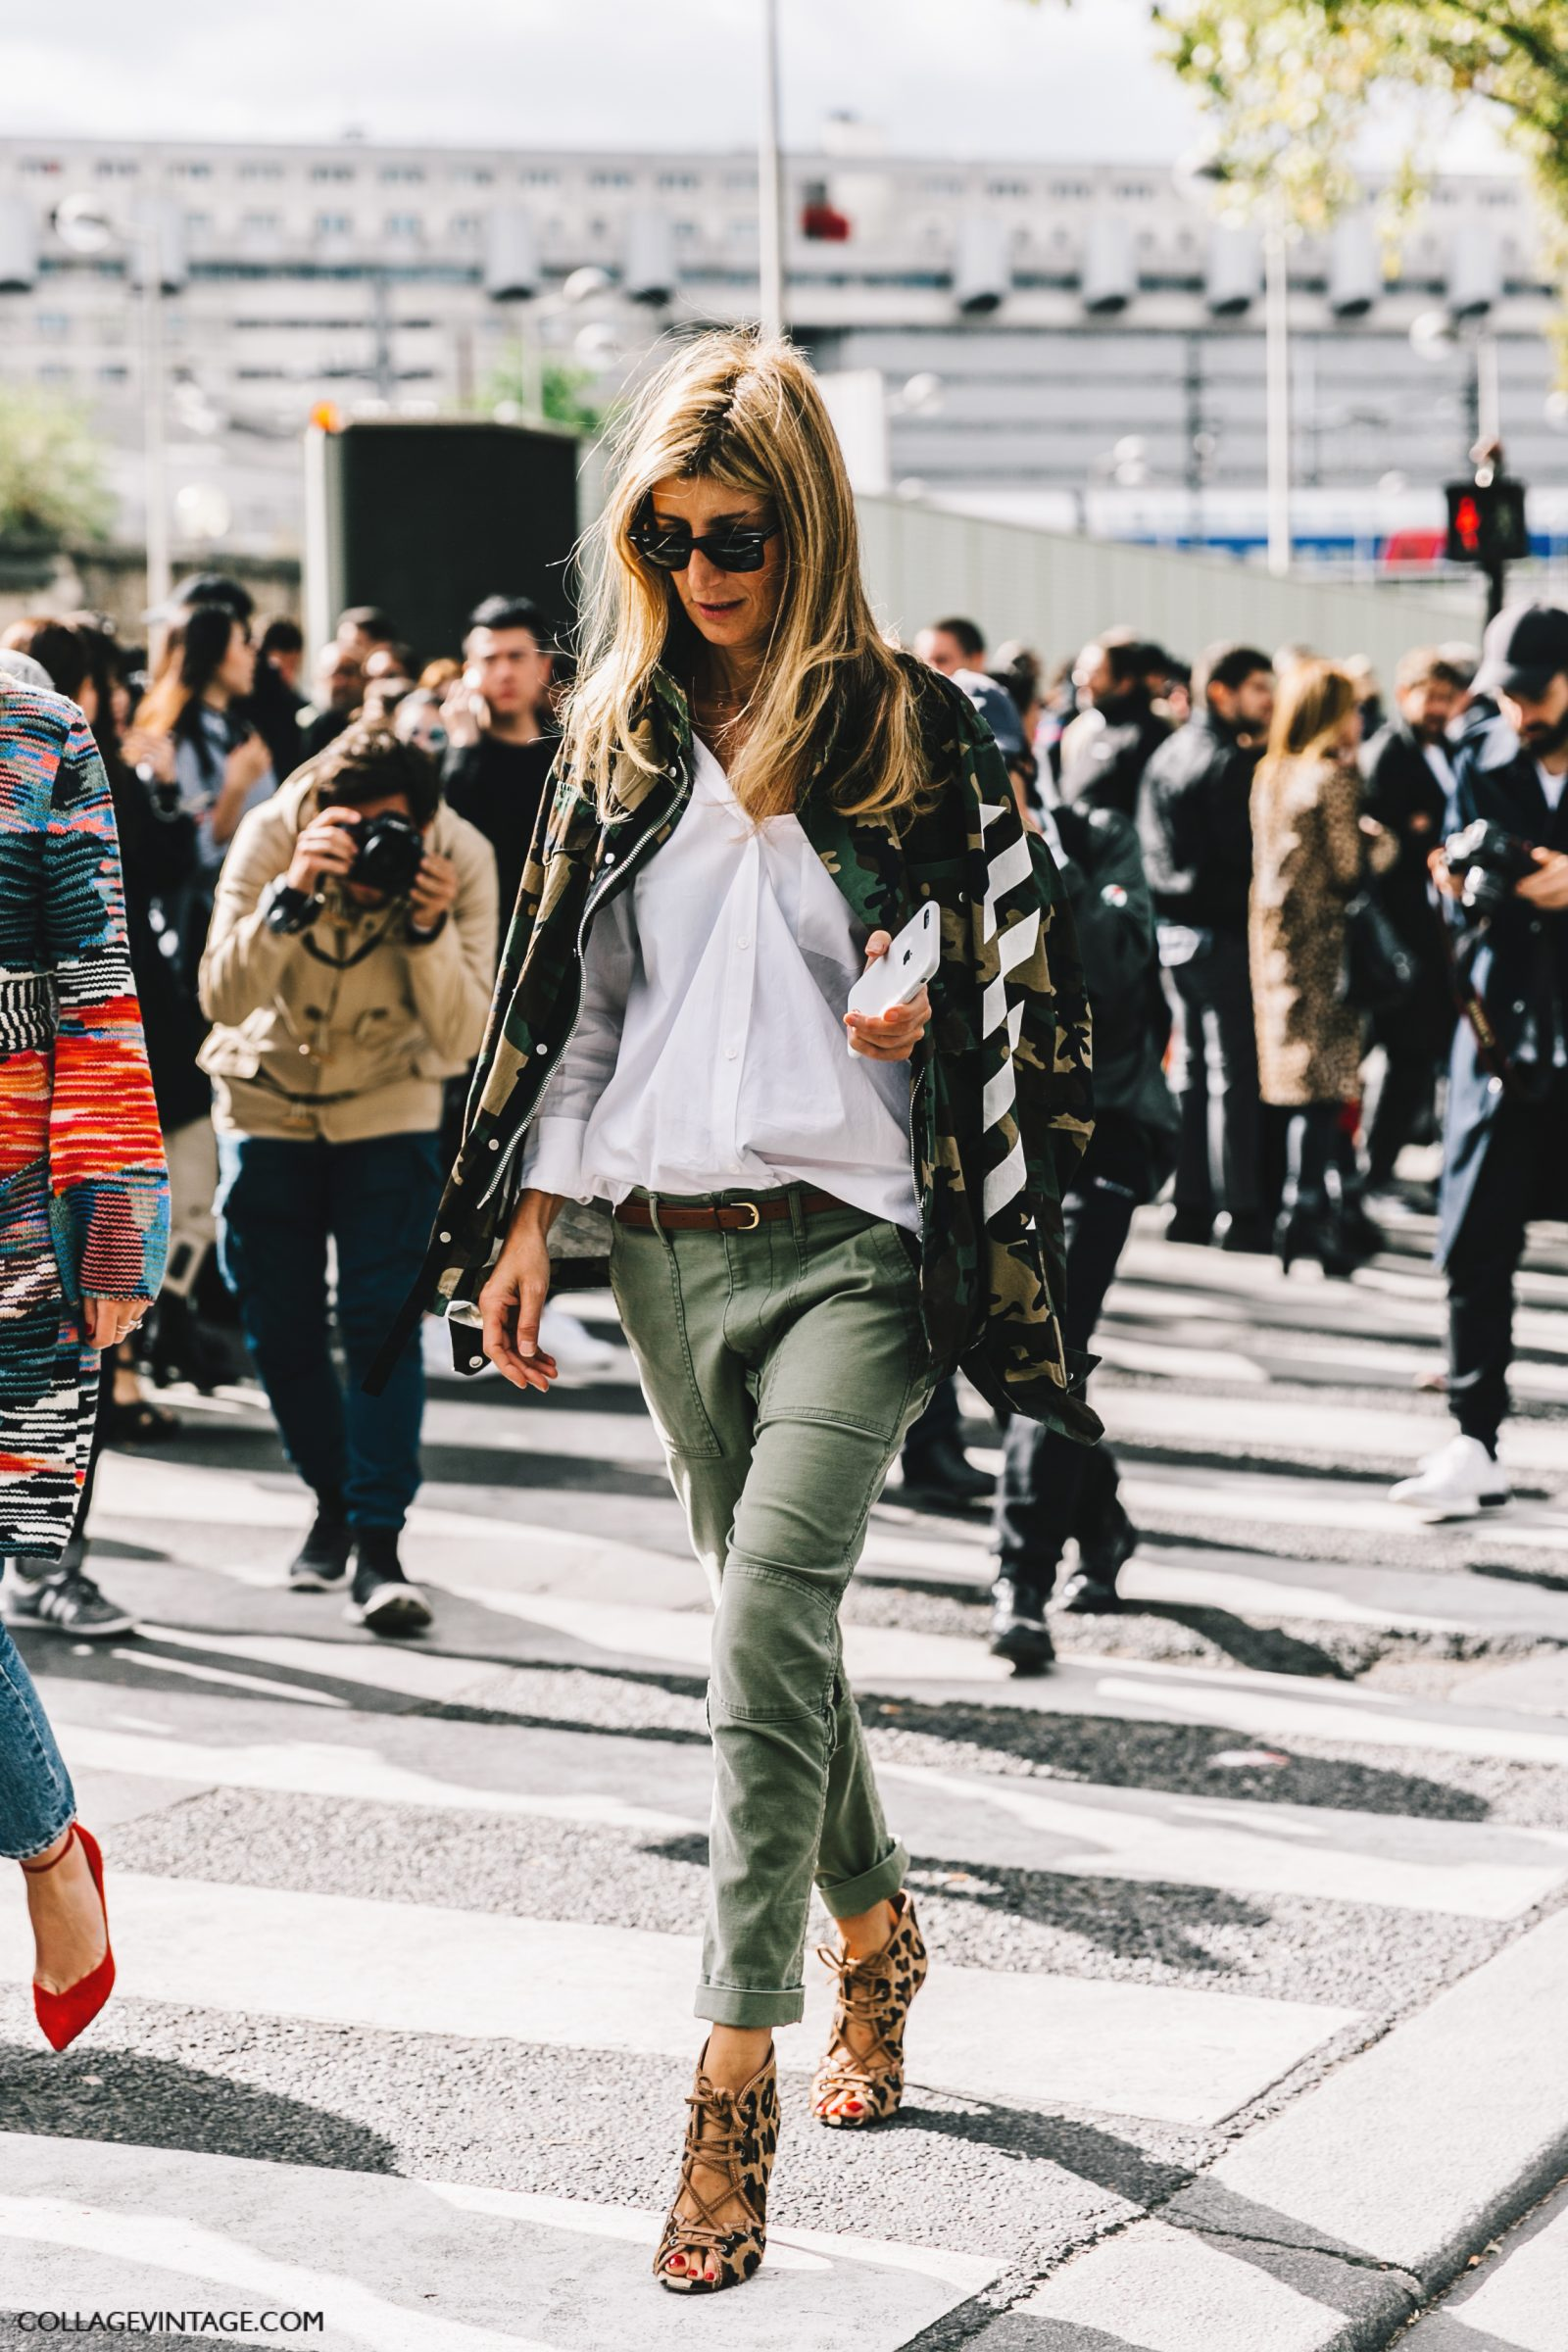 pfw-paris_fashion_week_ss17-street_style-outfits-collage_vintage-valentino-balenciaga-celine-27